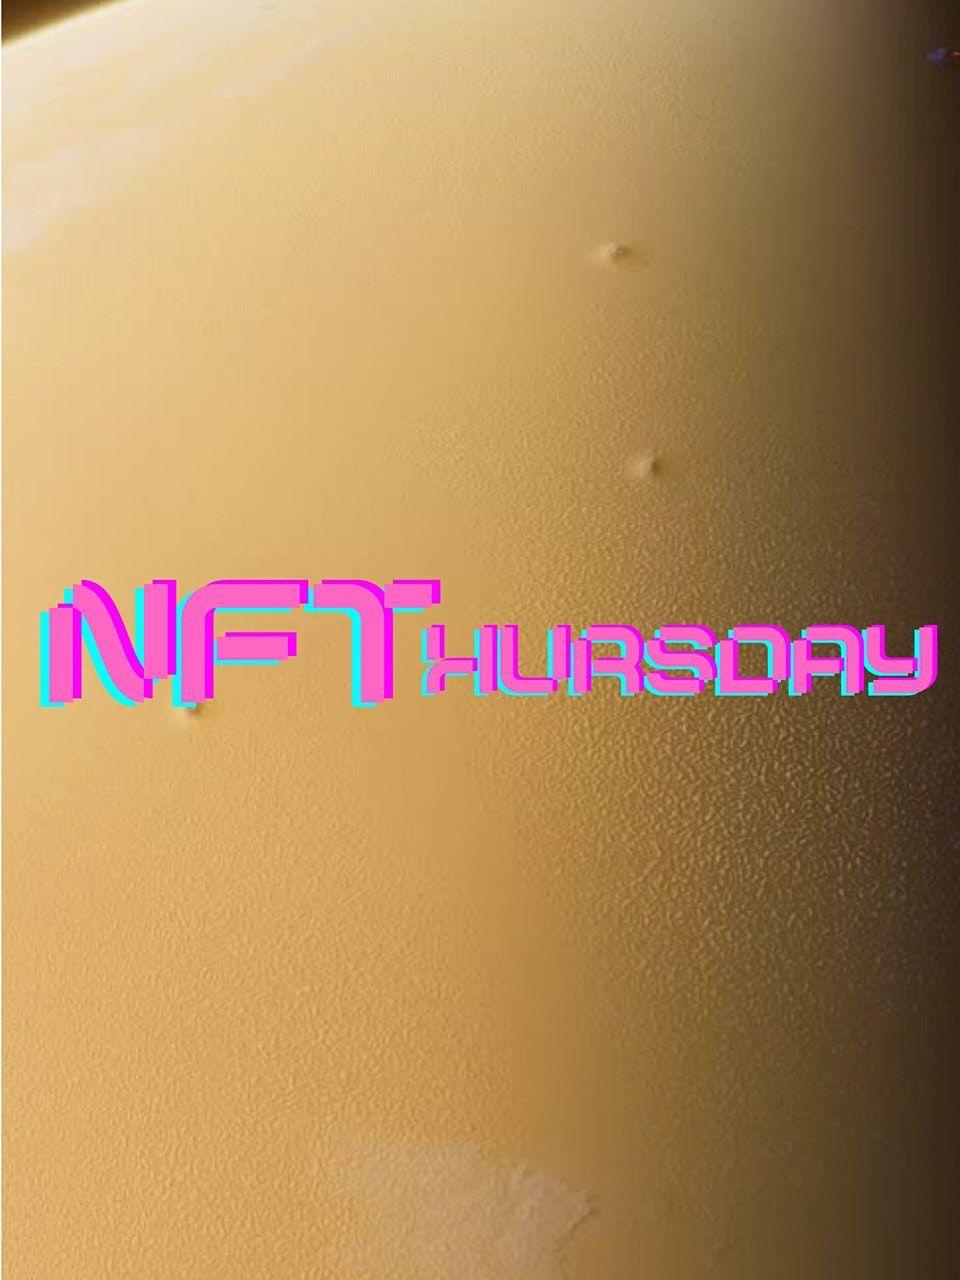 NFThursday: How to Buy an NFT